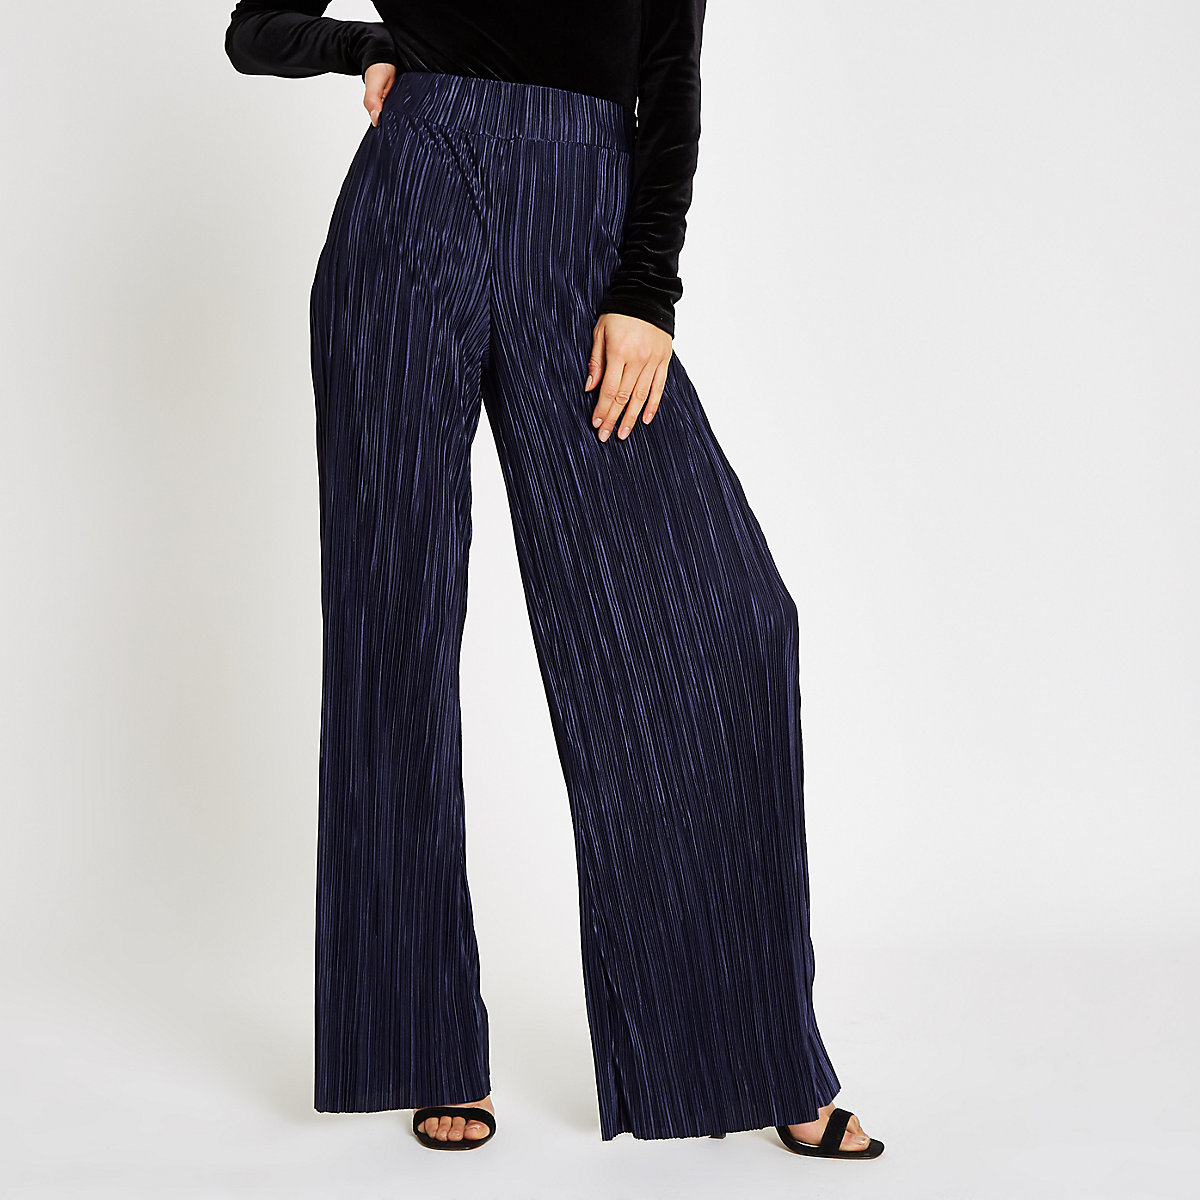 Navy plisse wide leg pants